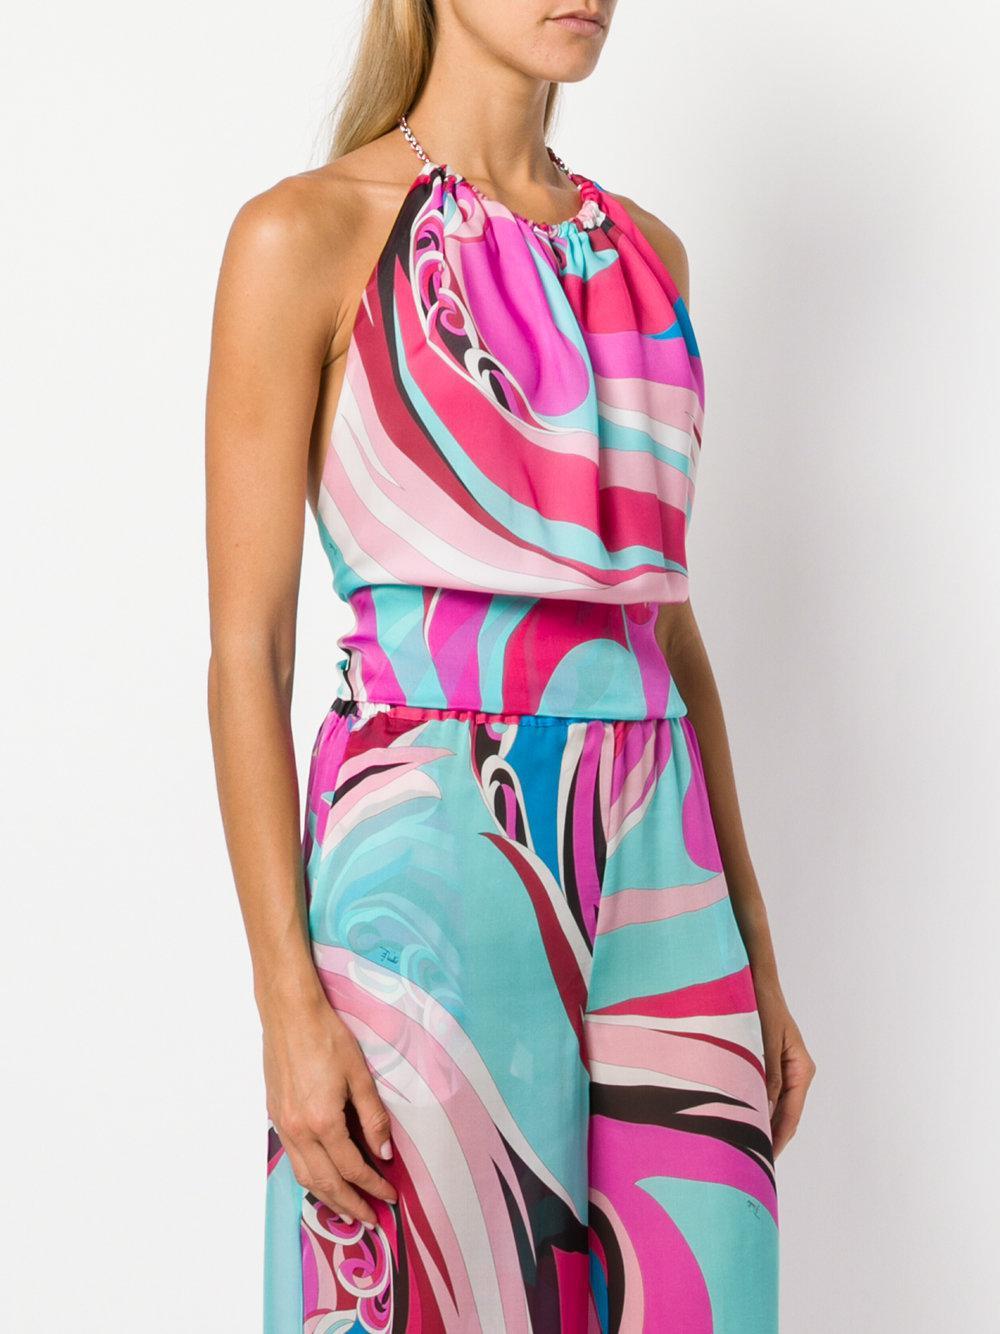 Buy Cheap Purchase abstract print halterneck blouse - Multicolour Emilio Pucci Discounts Sale Online Pre Order Outlet Collections OT2vP